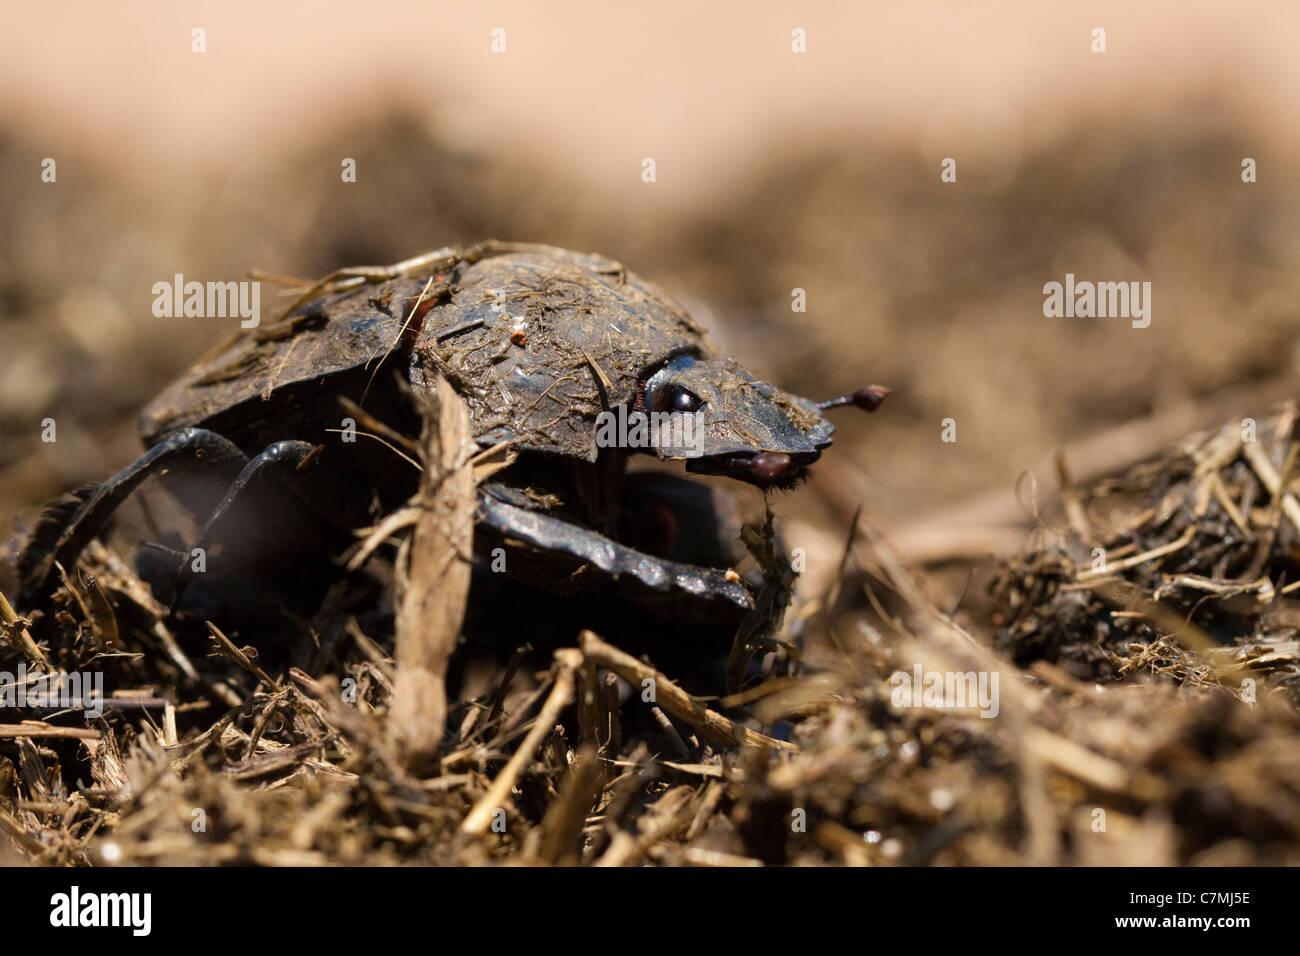 Flattened Giant Dungbeetle (pachylomerus femoralis). Ndumo Game Reserve, Kwazulu-Natal, South Africa. November 2010. - Stock Image